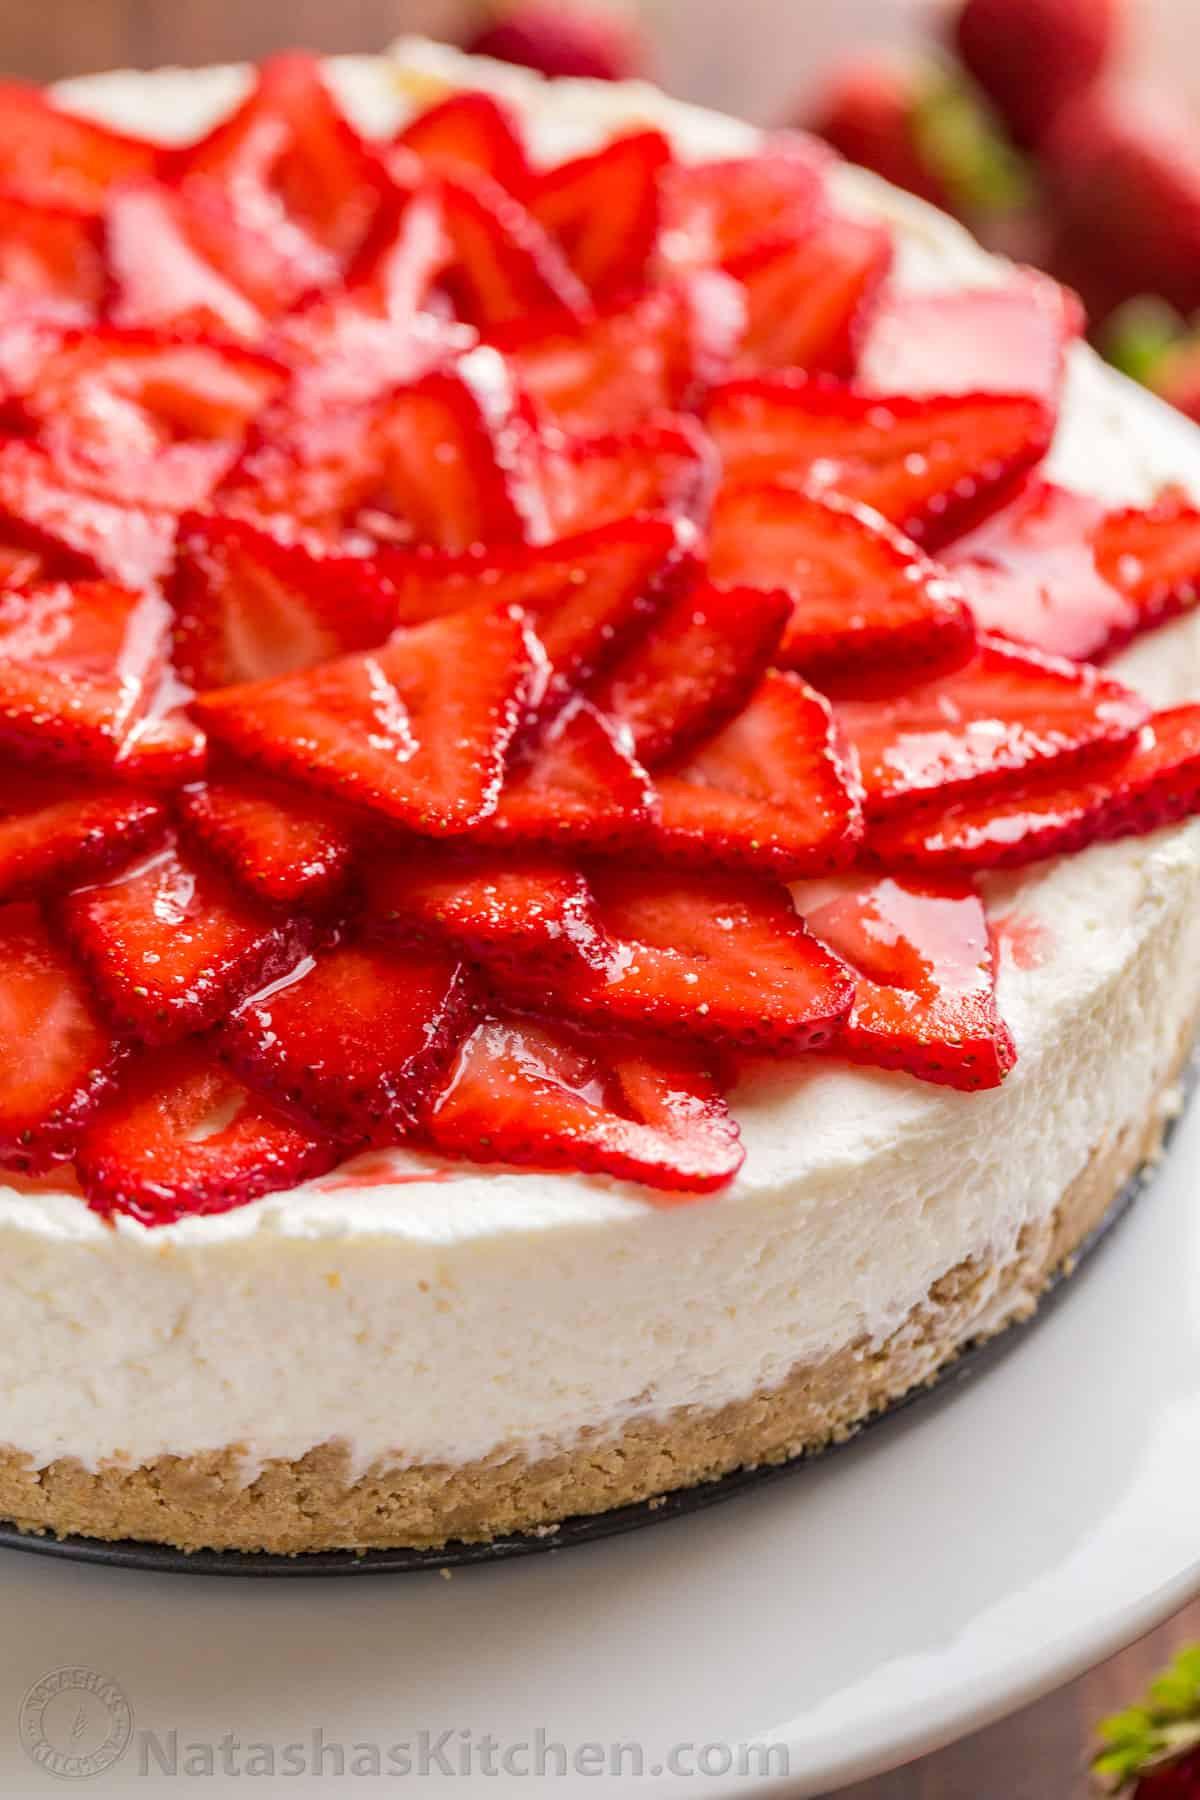 Cheesecake Recipe No Bake  No Bake Cheesecake with Strawberries VIDEO